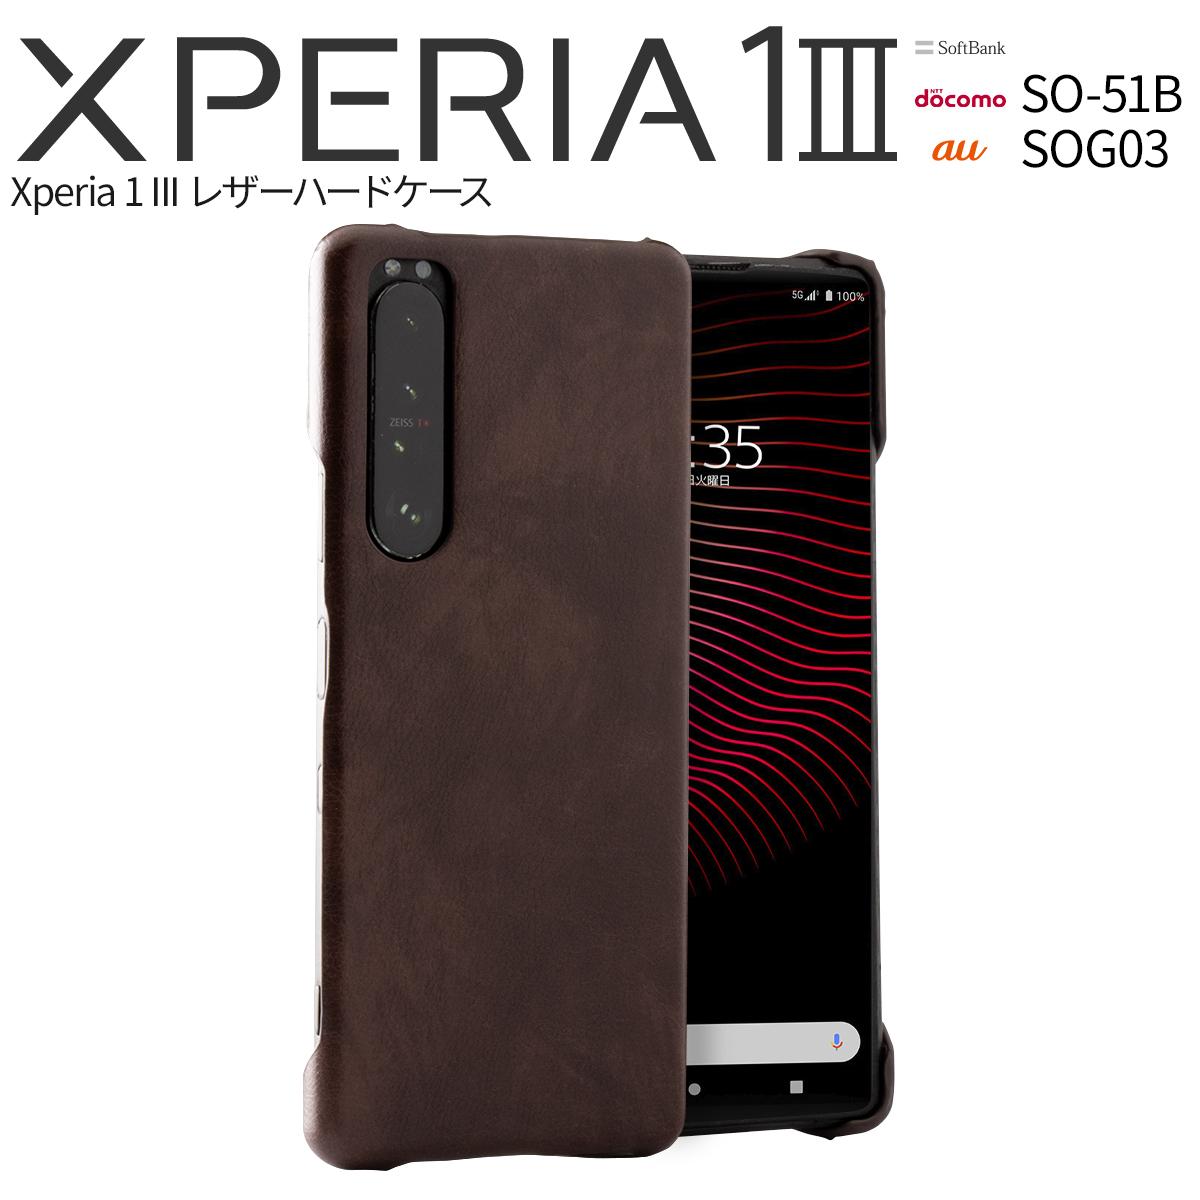 Xperia 1 III SO-51B SOG03 レザーハードケース